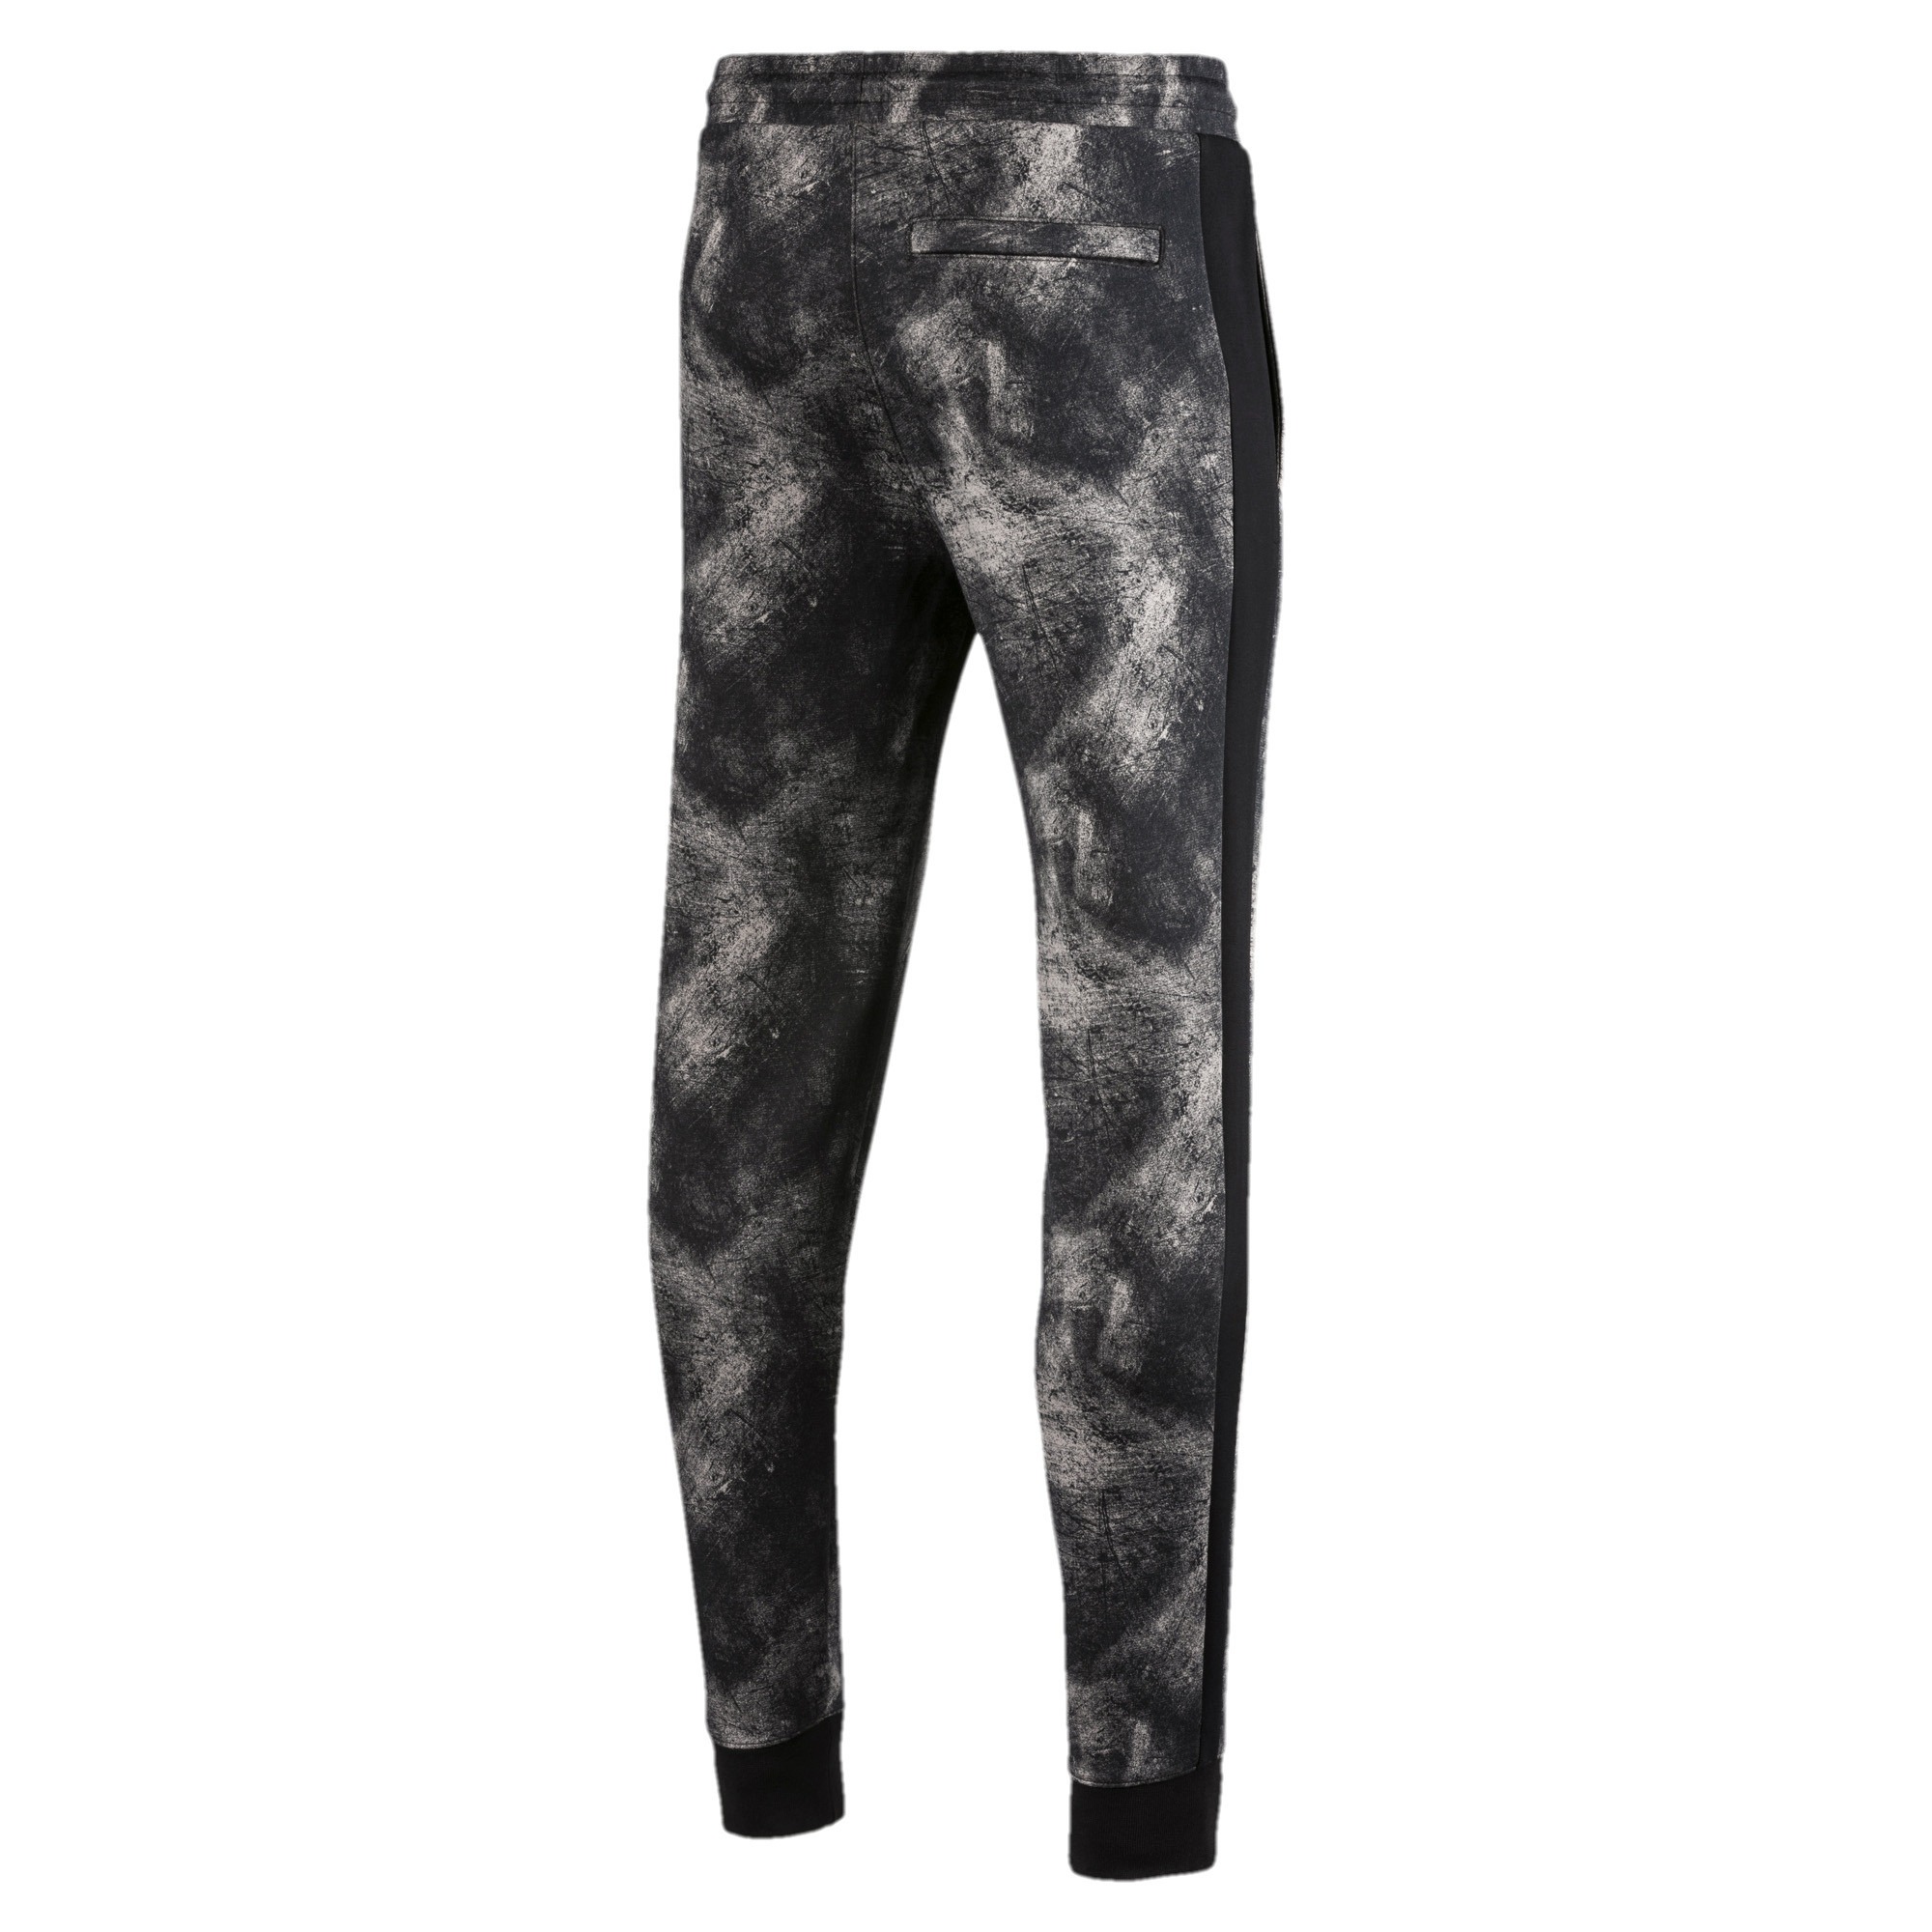 Pantalones deportivos con motivo gráfico Classics T7 para hombre